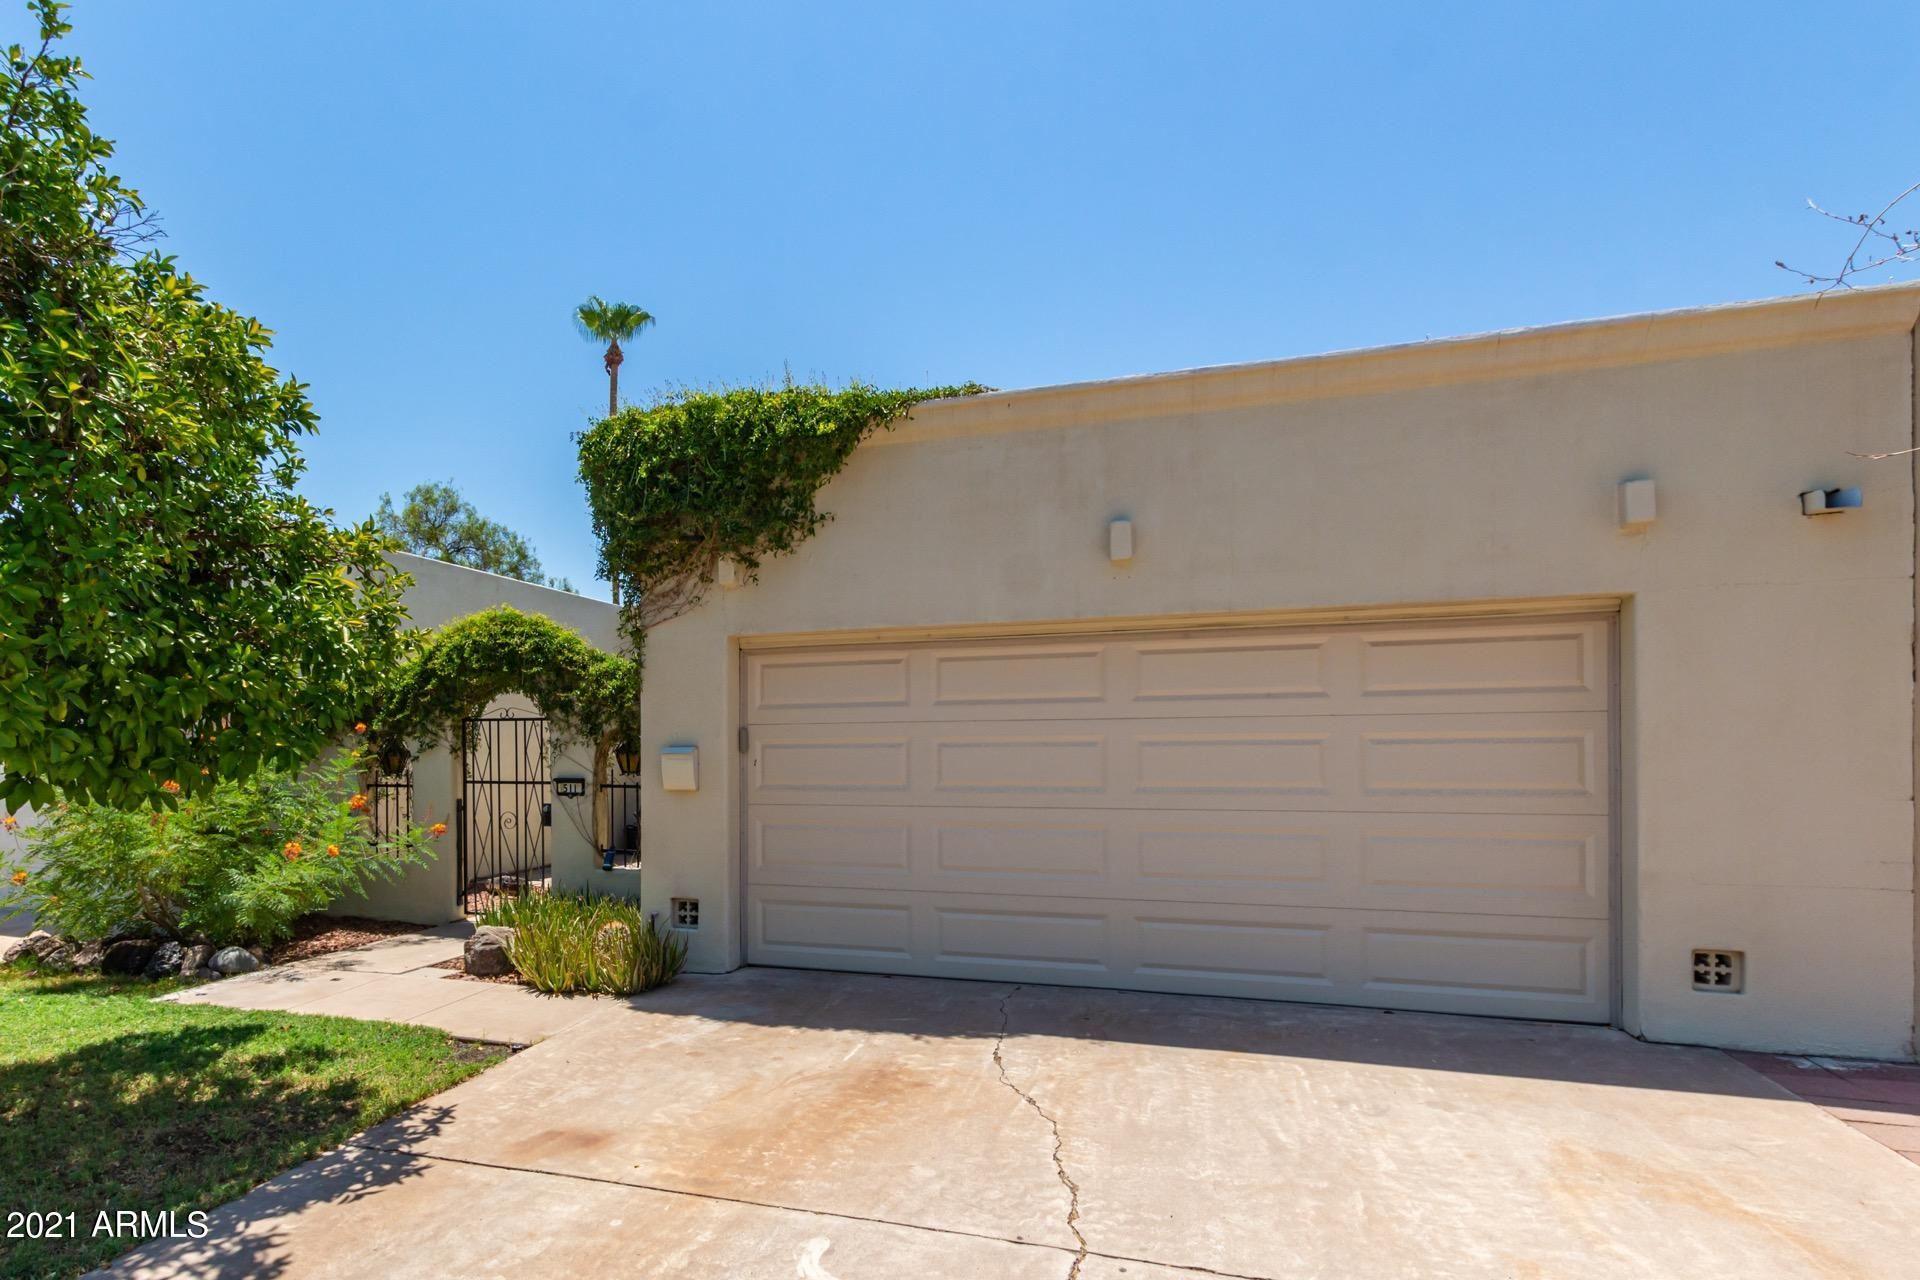 Photo of 511 W MALIBU Drive, Tempe, AZ 85282 (MLS # 6271729)